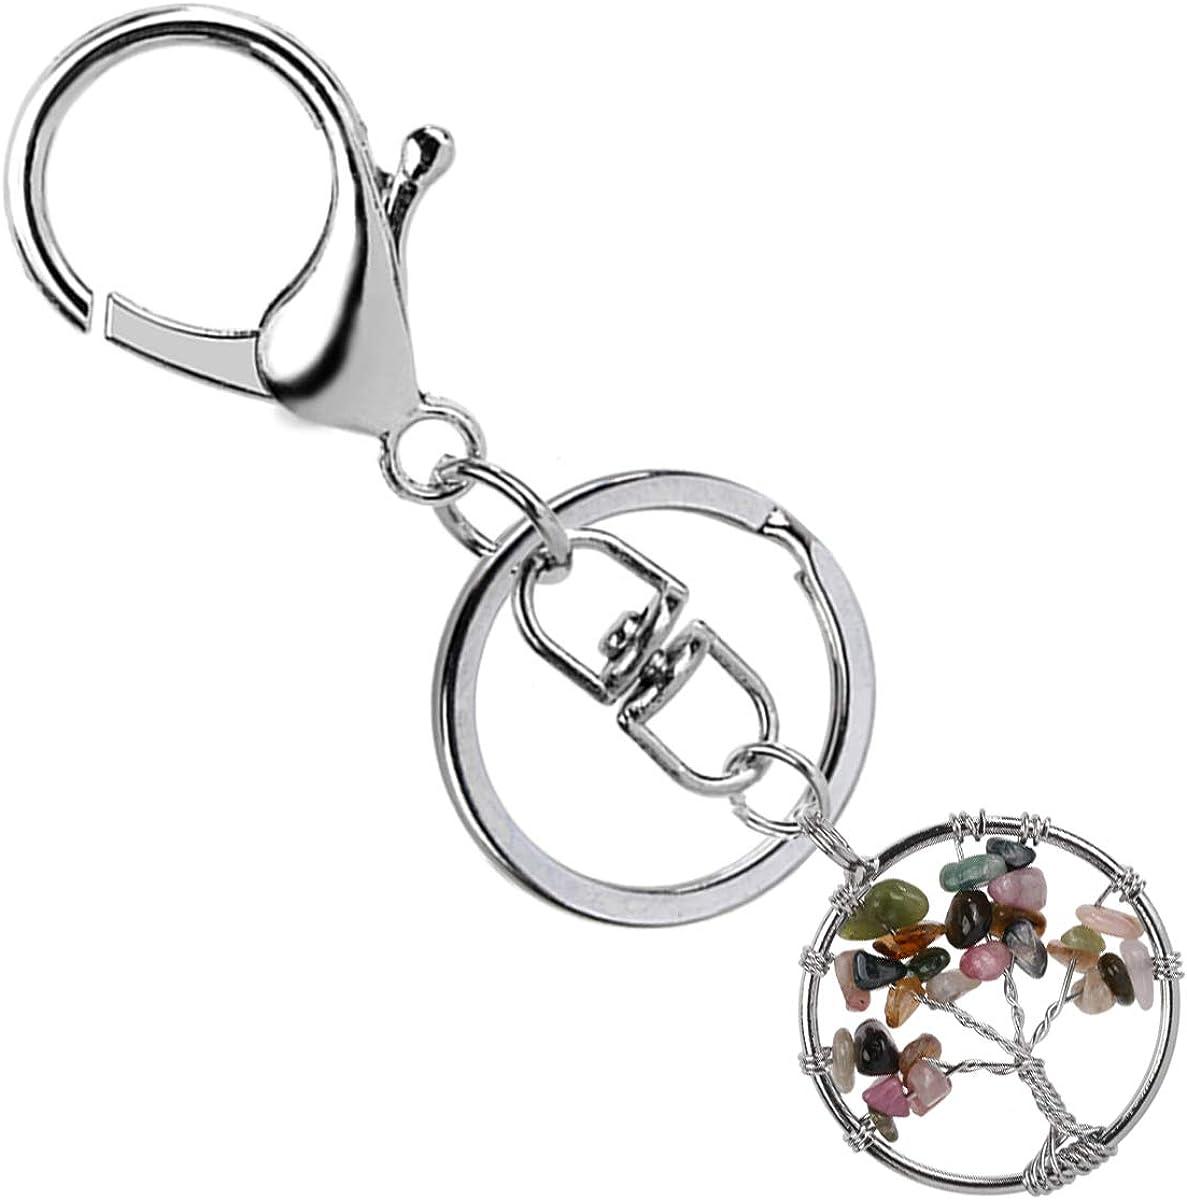 Szxc Silver Metal Swivel Lobster Clasps Lanyard Snap Hook Lobster Clasp Clip with Tree of Life Gemstone Pendant Birthstone Keychain Keyring Keyfob Key Holder